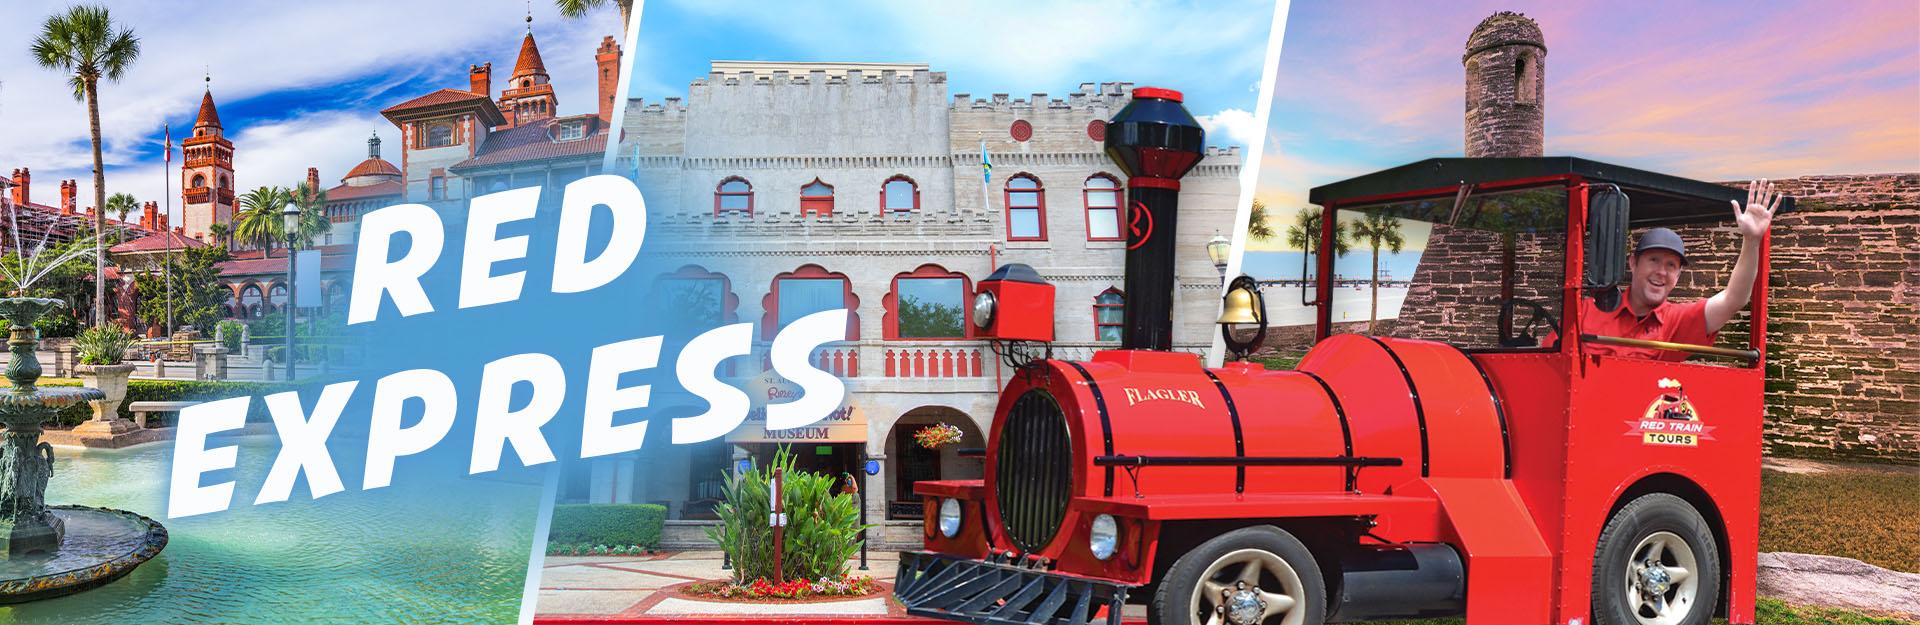 Red Express Tour Image